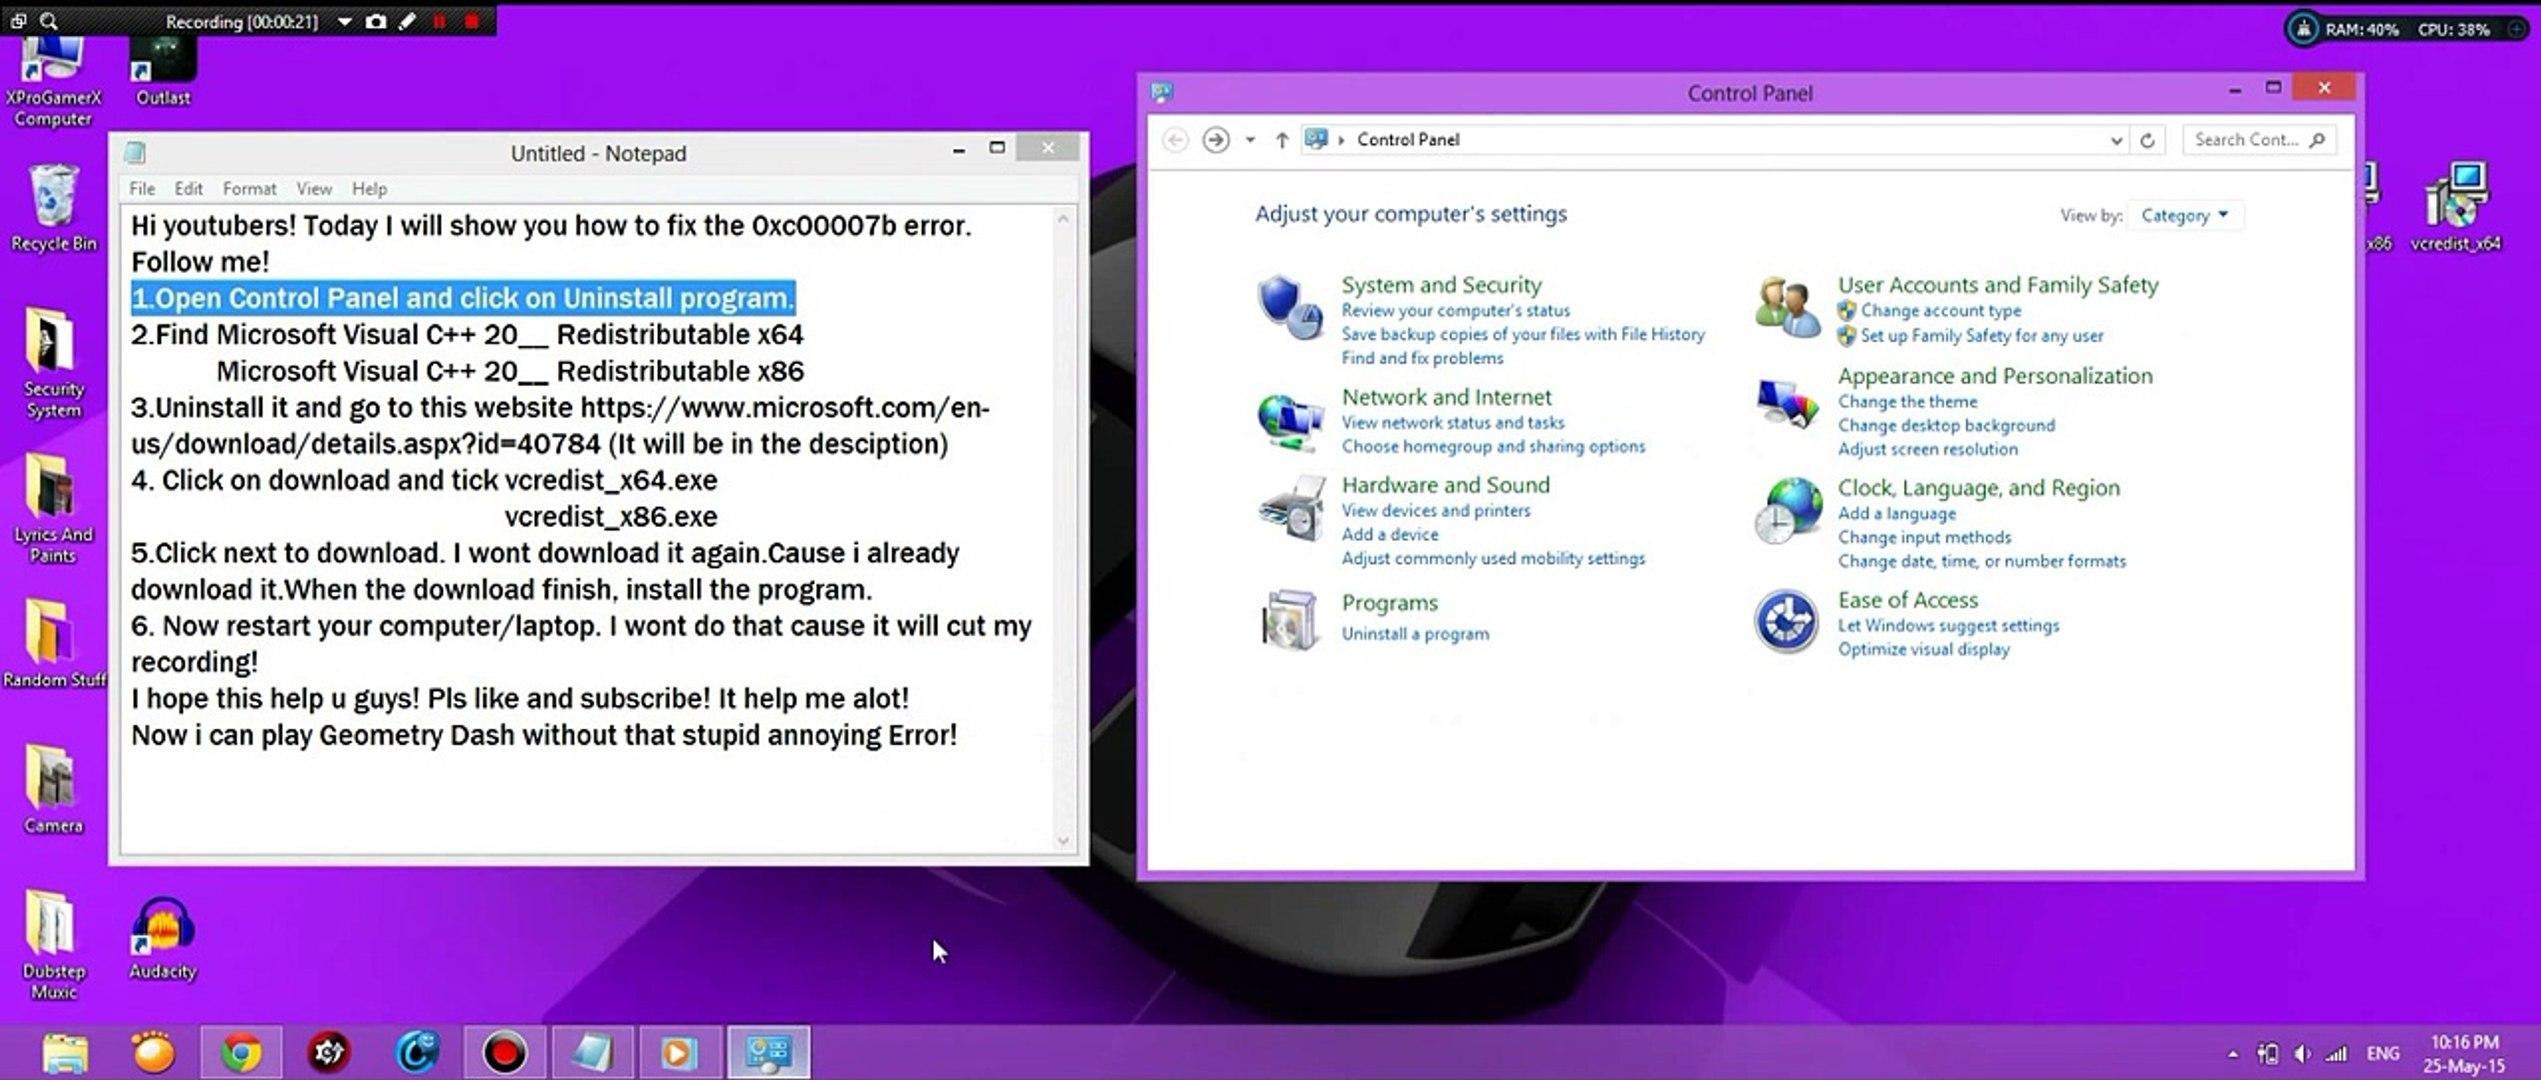 [How To] Fix 0xc00007b error on Window 8/7 [Tutorial]